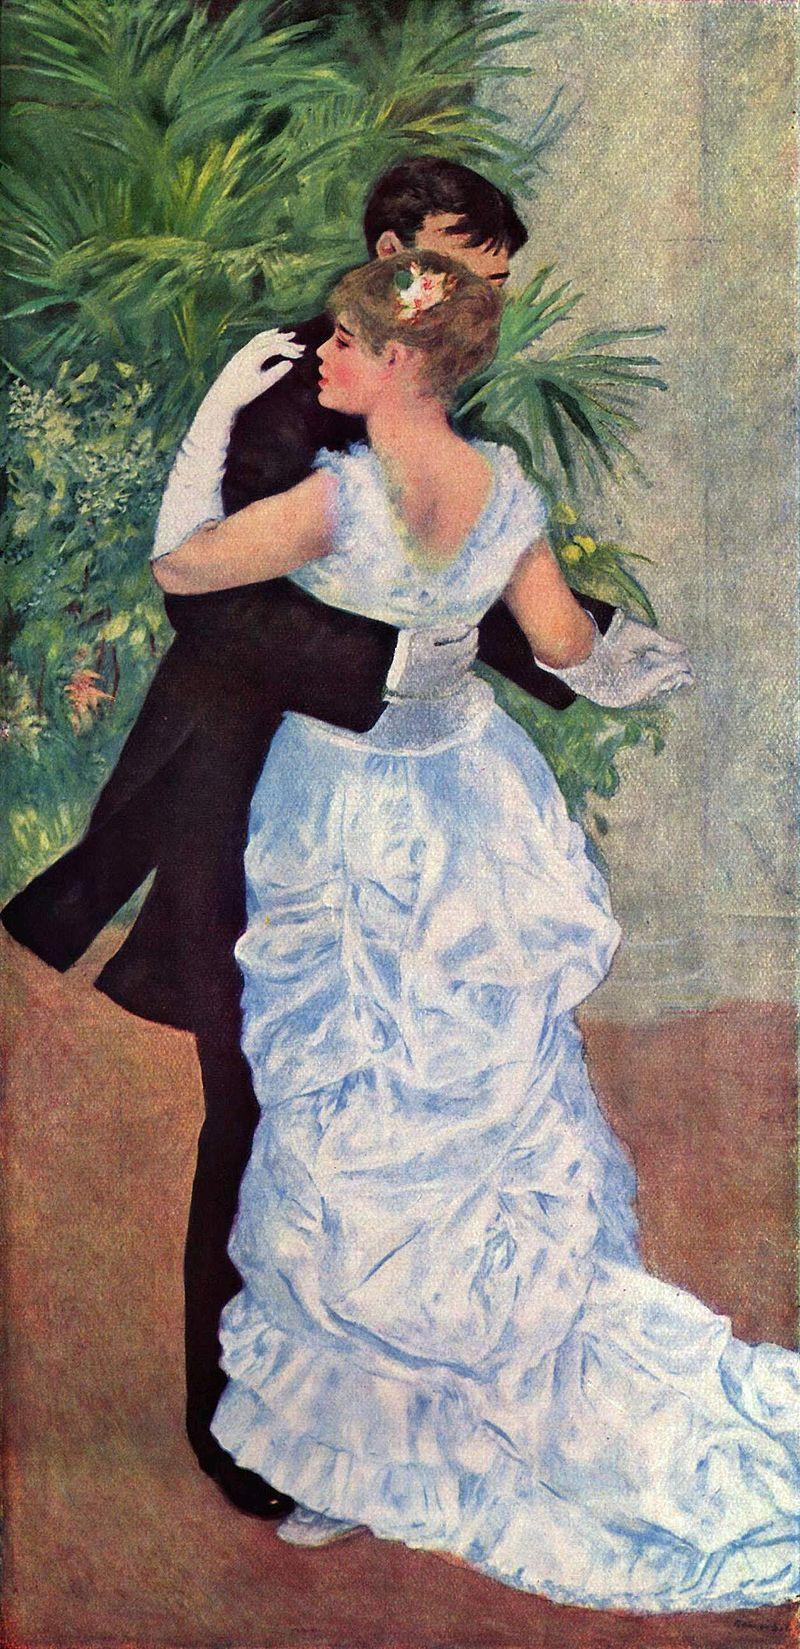 Pierre-Auguste Renoir's 1883 painting, Dance in the City